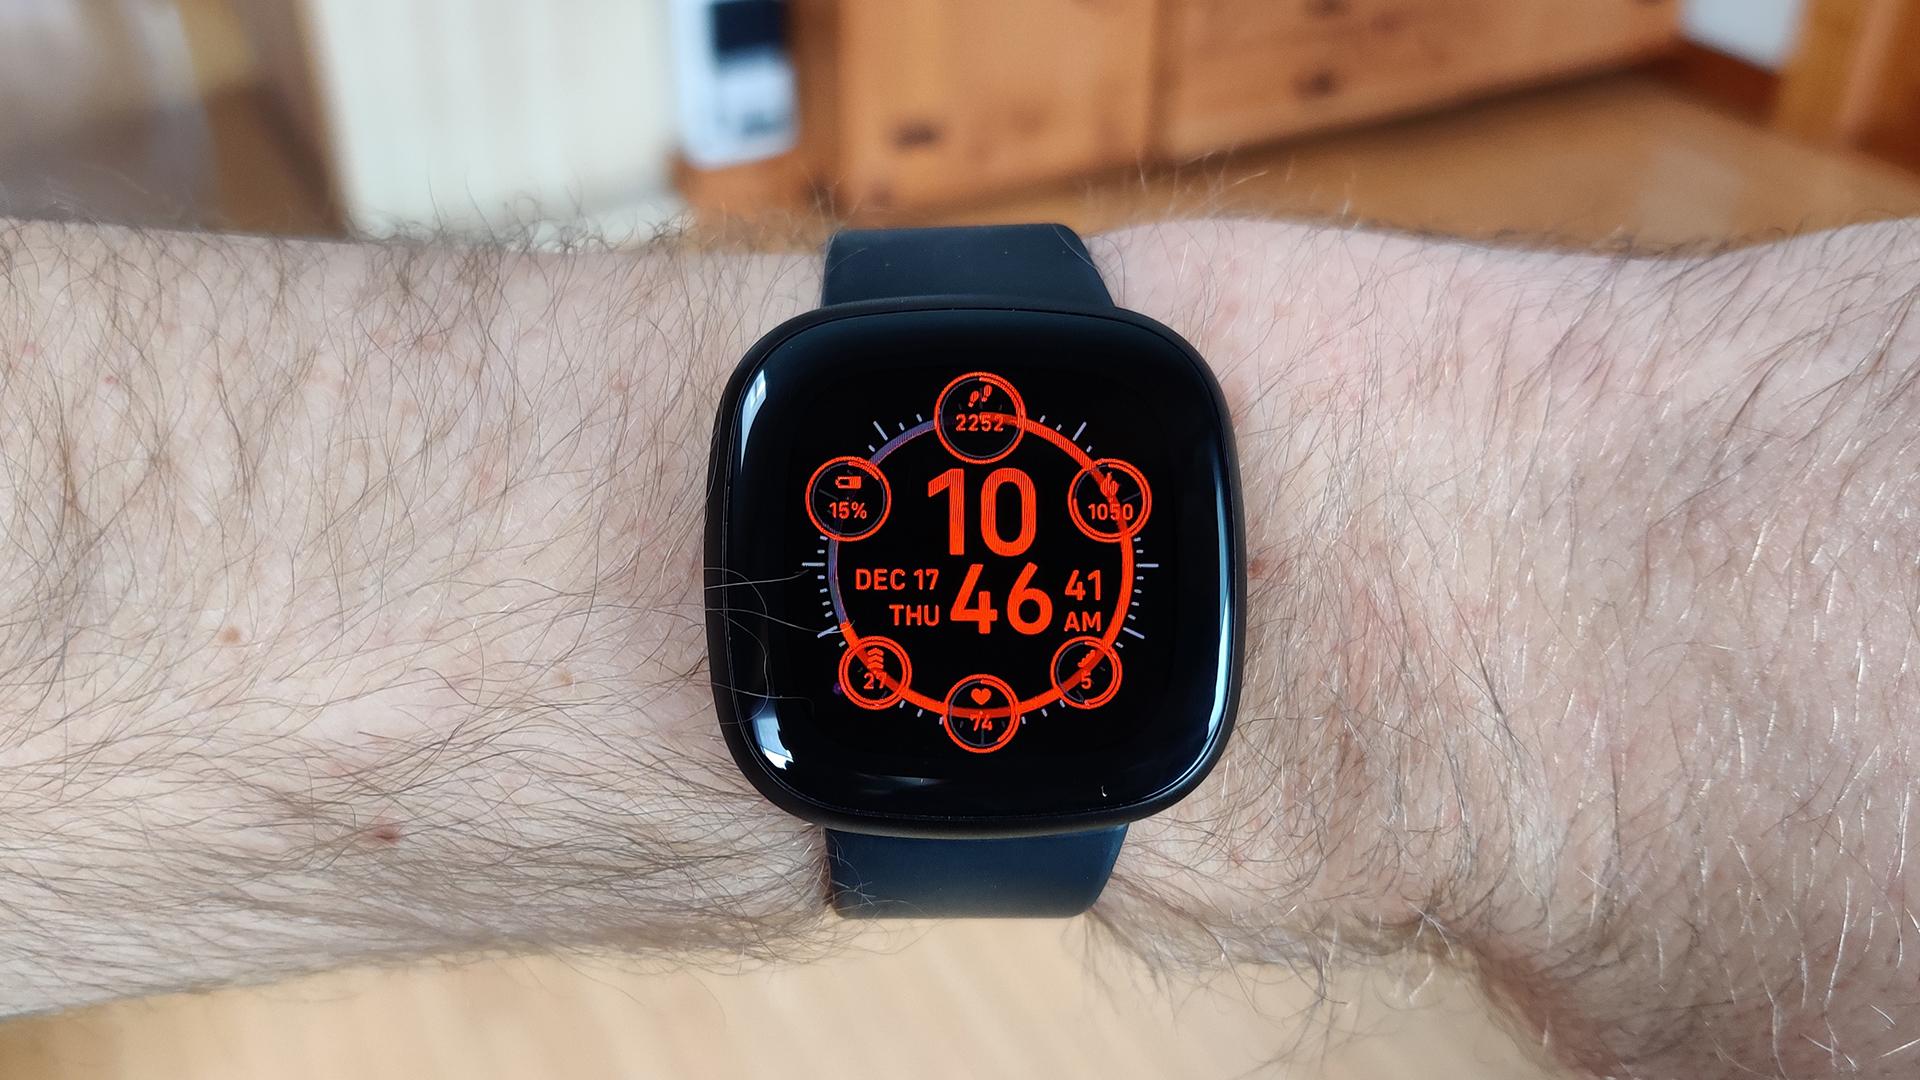 Fitbit Versa 3 Review Main Display on Wrist